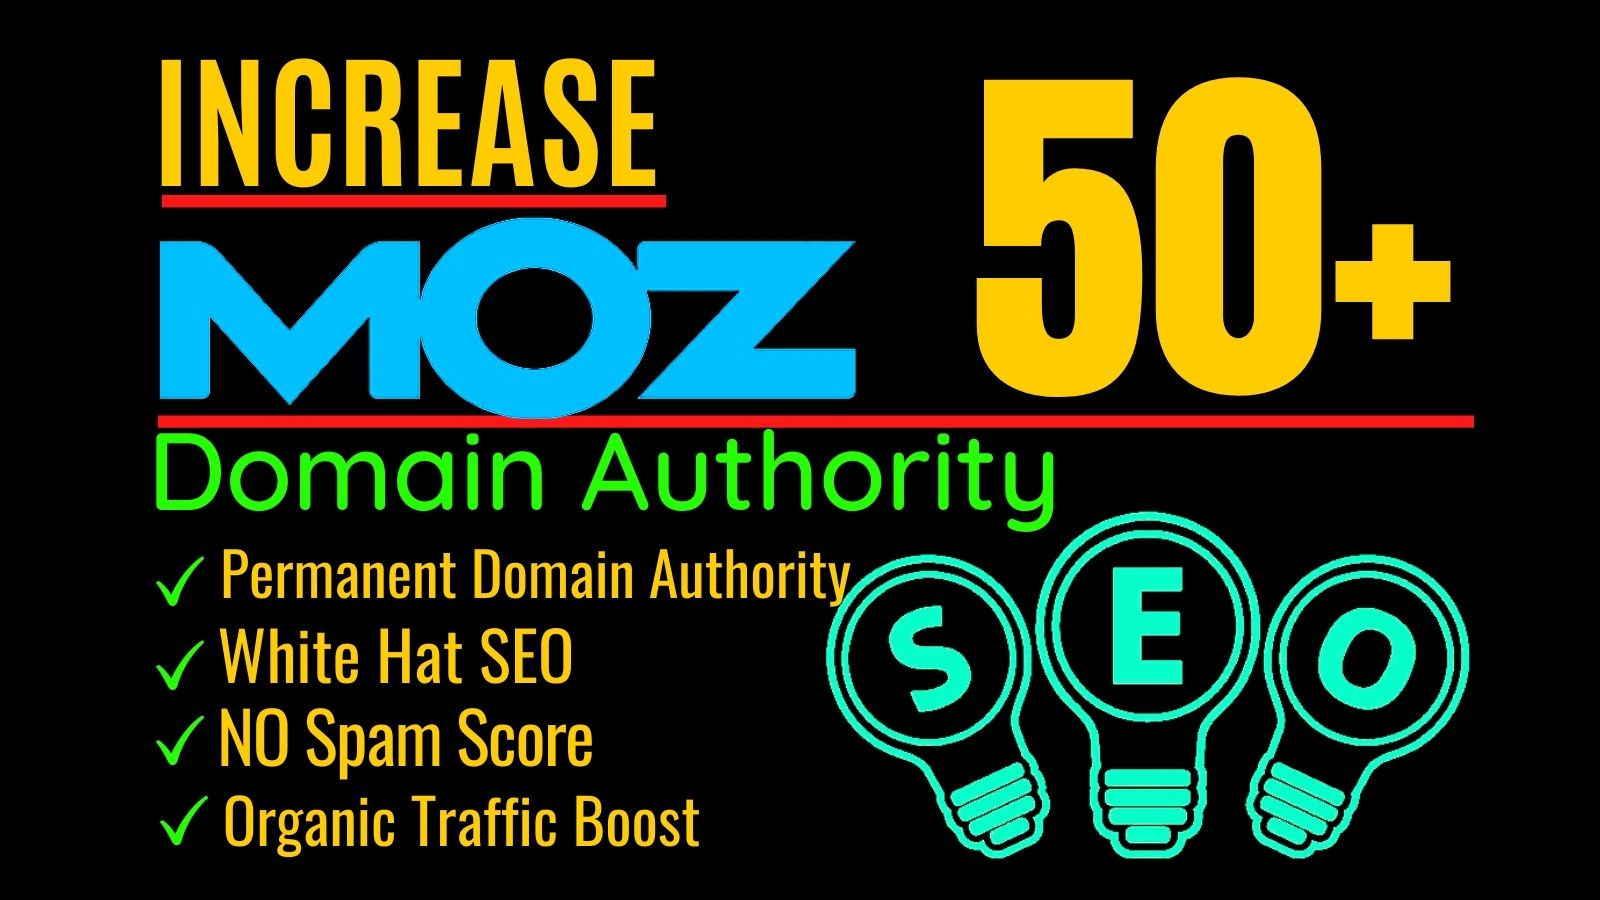 I will increase Moz domain authority or increase domain Authority DA 50 plus